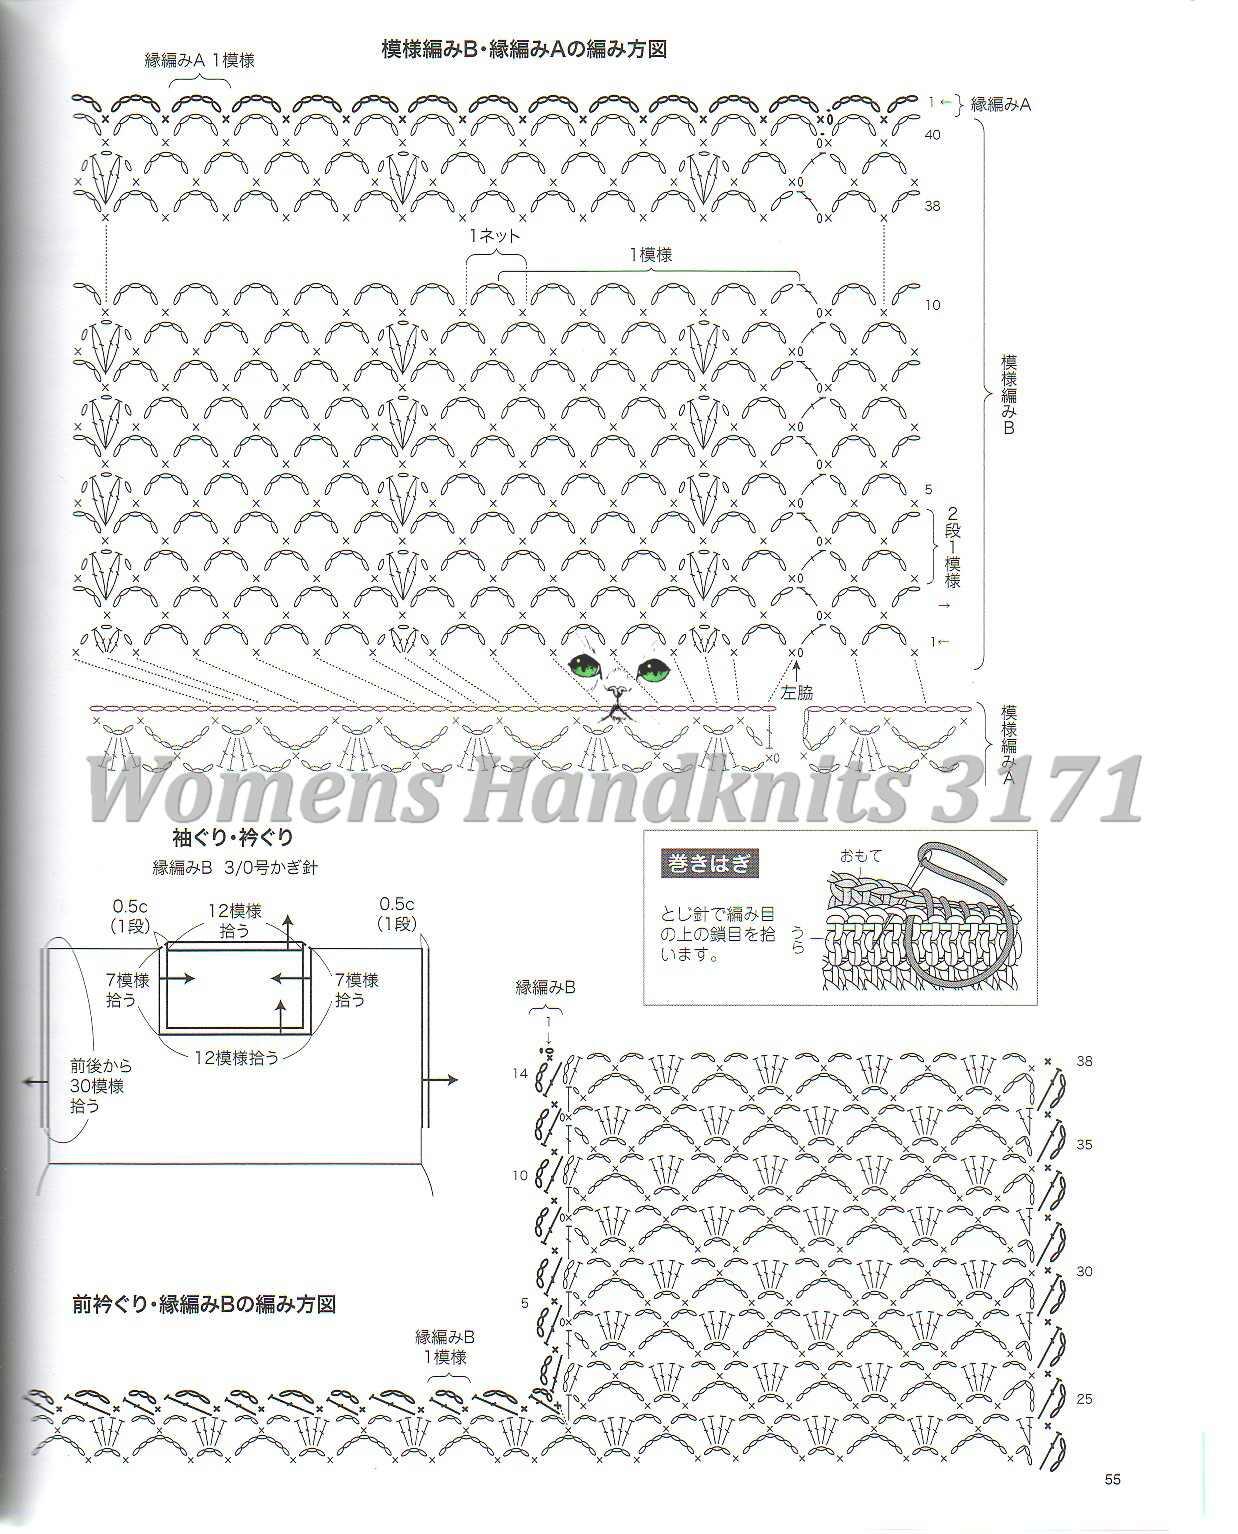 0599_Womens Handknits 3171_023_2